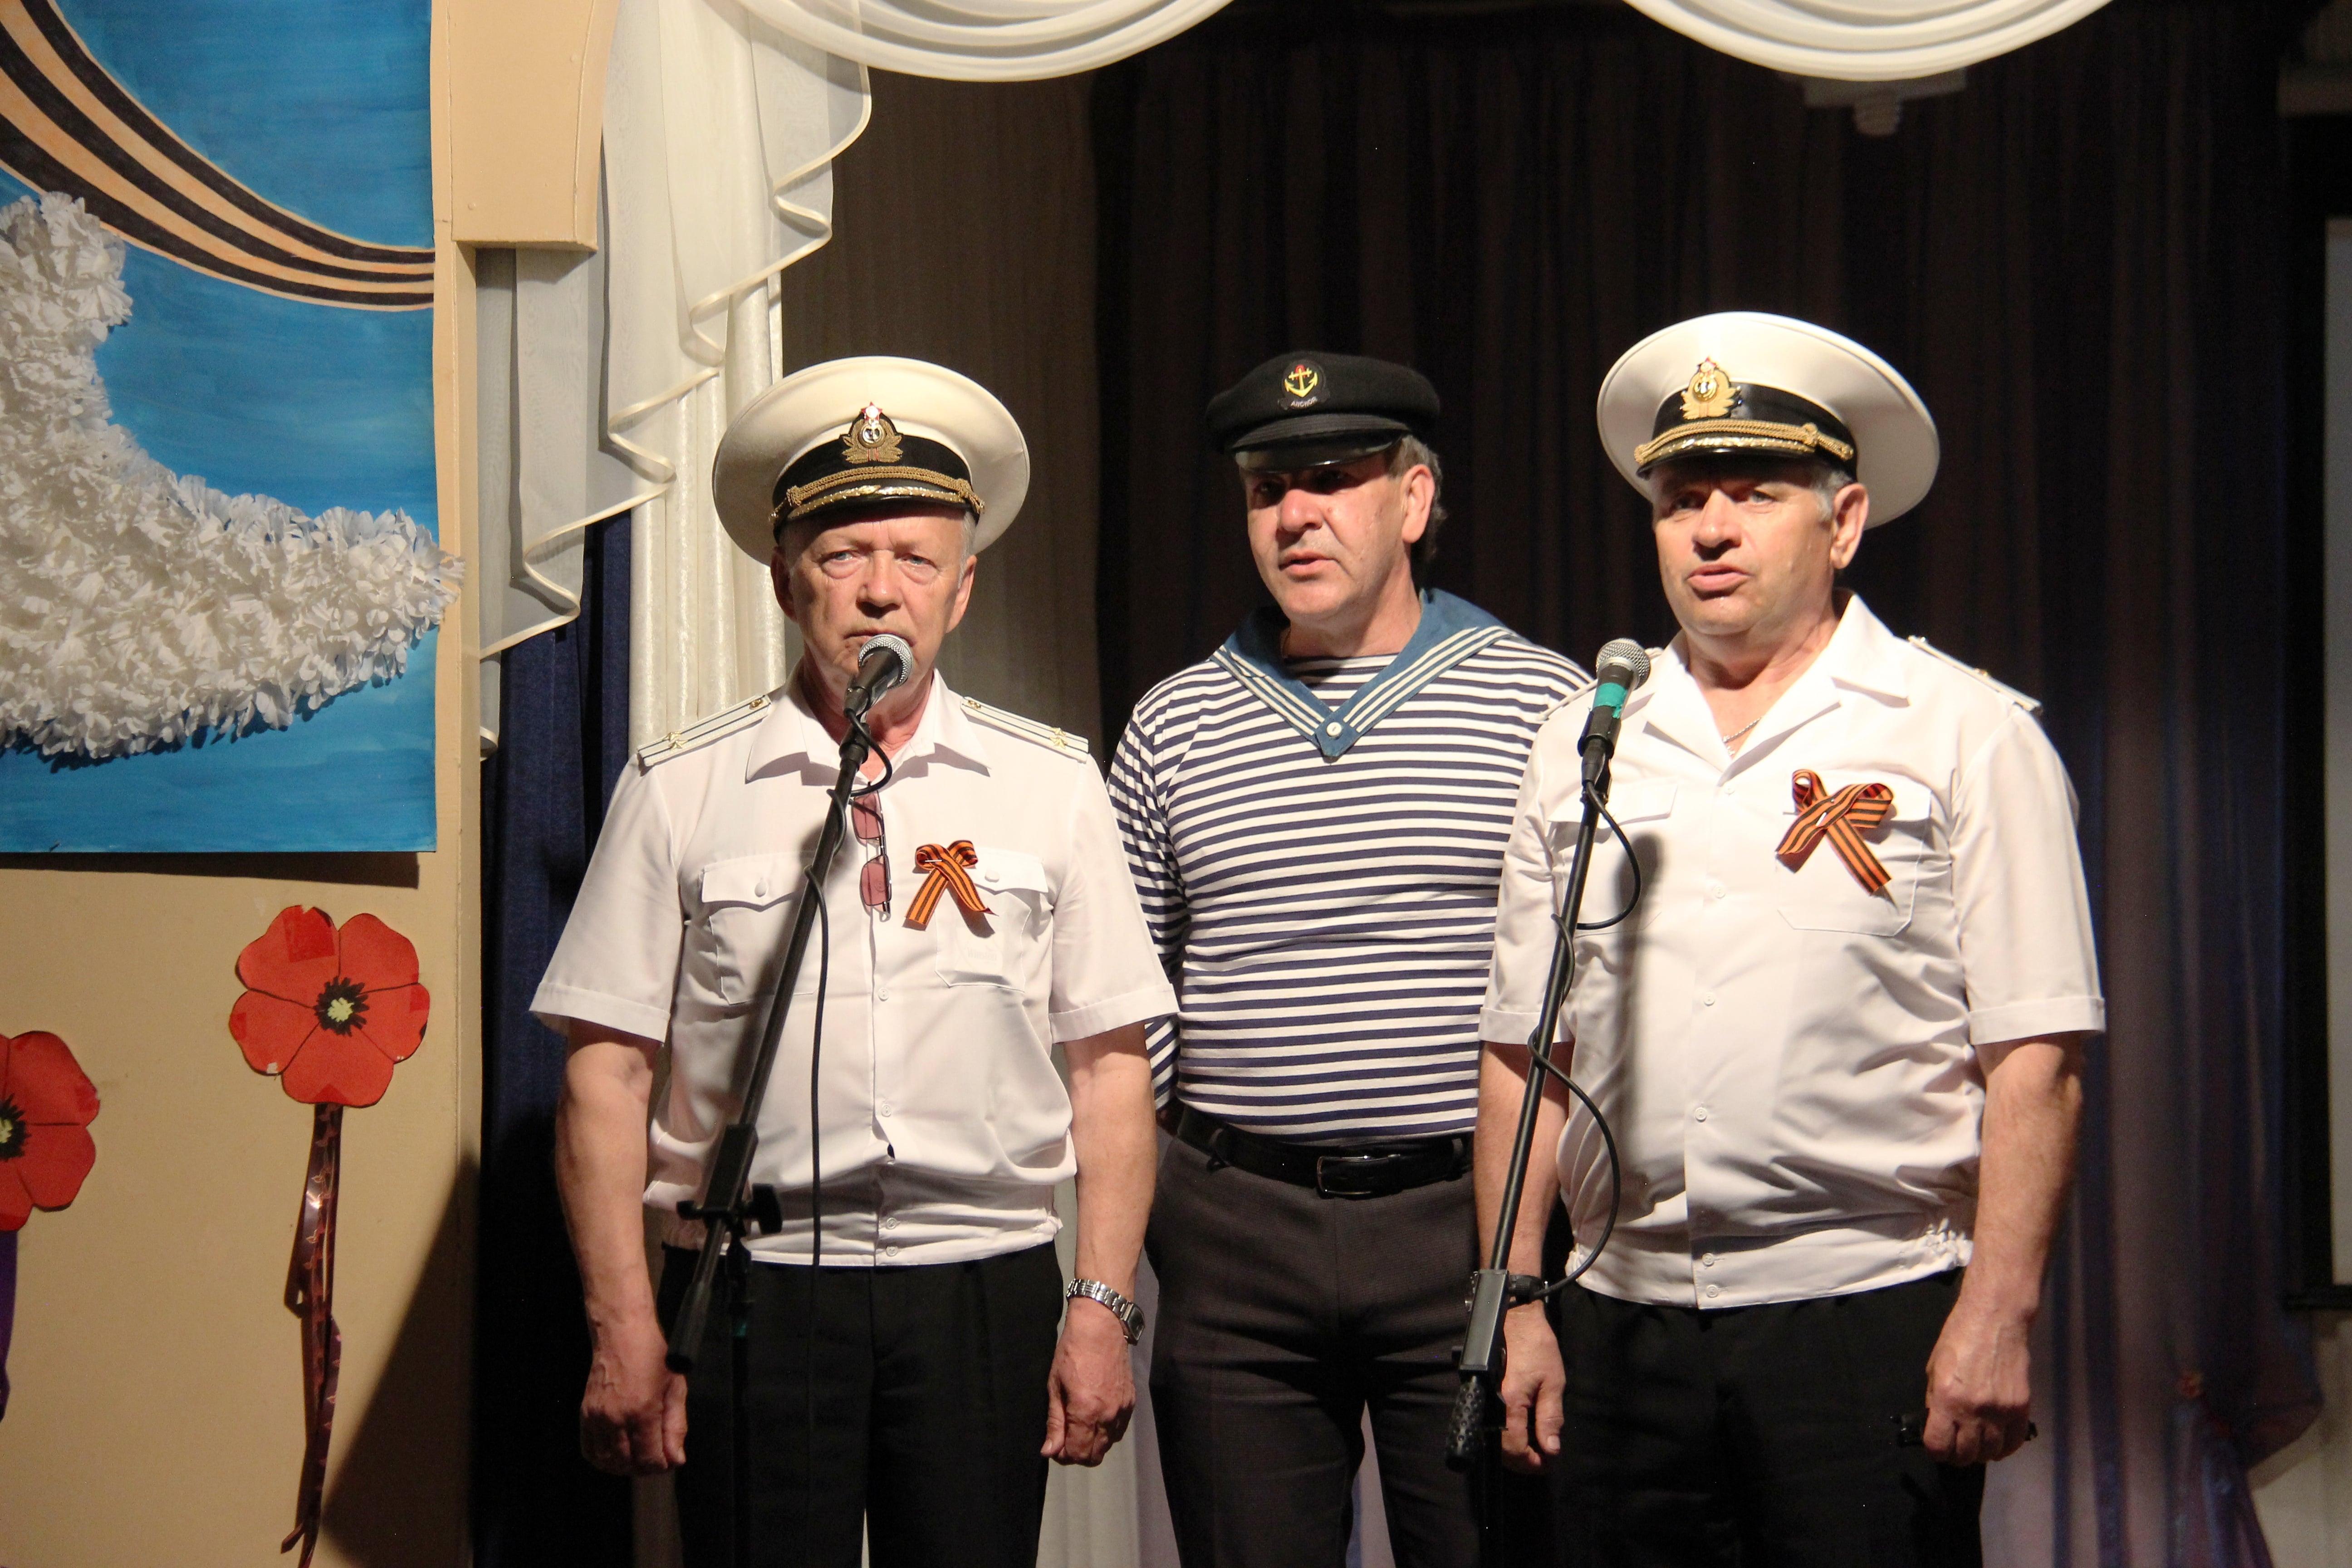 http://monuspen.ru/photoreports/b3afe9db7b5af7083492e2c5aff7c180.JPG